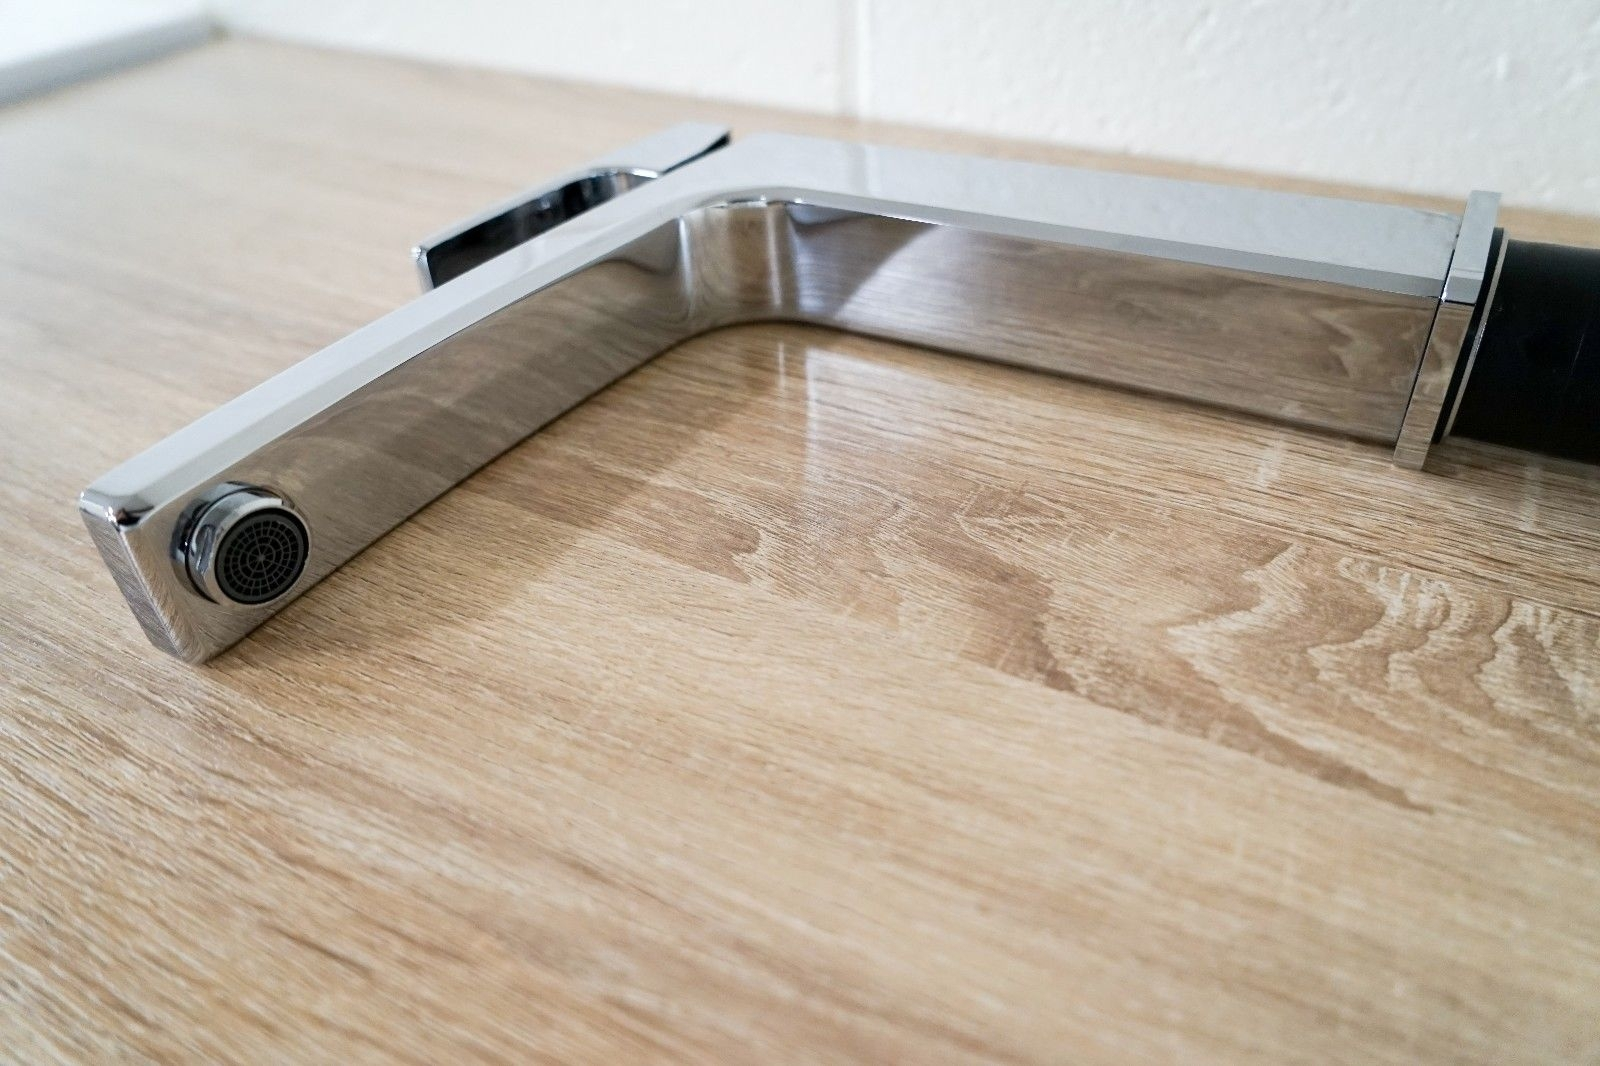 Square MATTE BLACK 120° Swivel Medium Rise Tall Vessel Basin Kitchen Sink Mixer